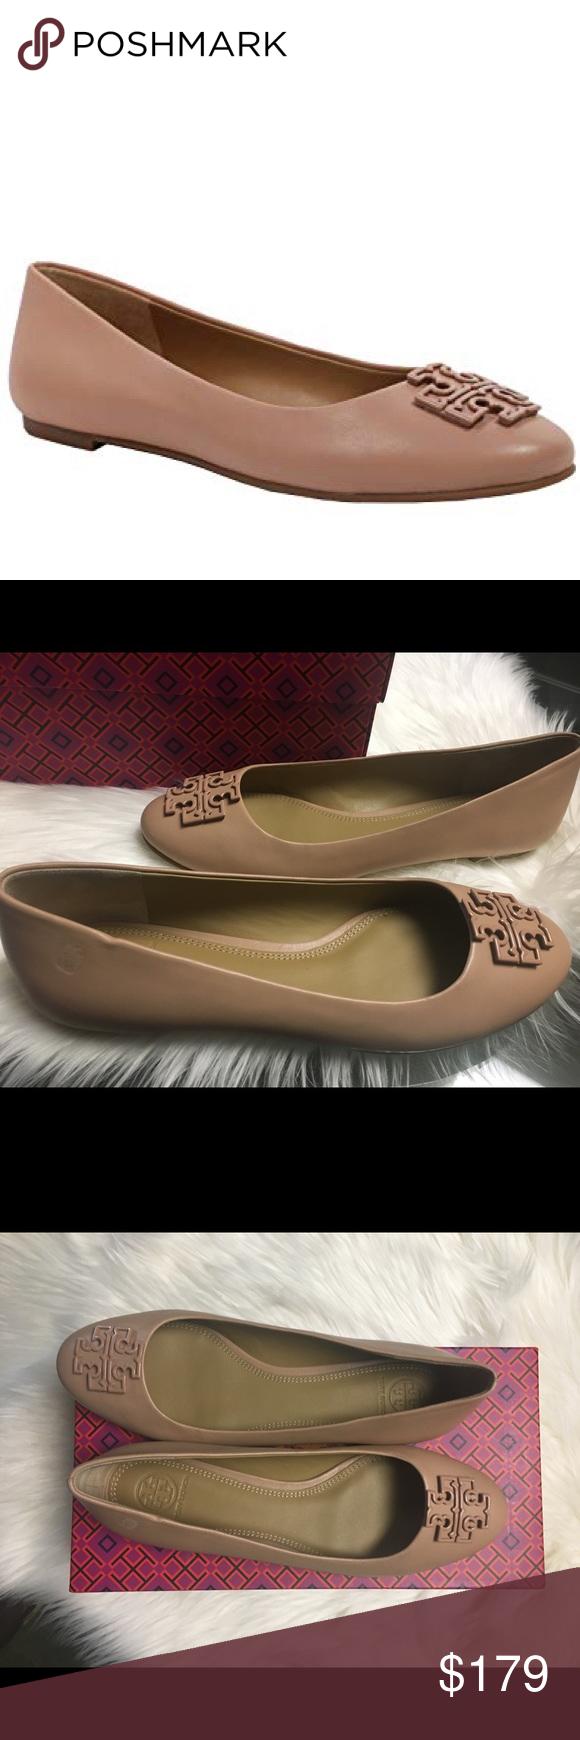 a3244c714 TORY BURCH Melinda Leather Flats Light Makeup NEW TORY BURCH Melinda  Leather Flats Shoes Ballerina Light